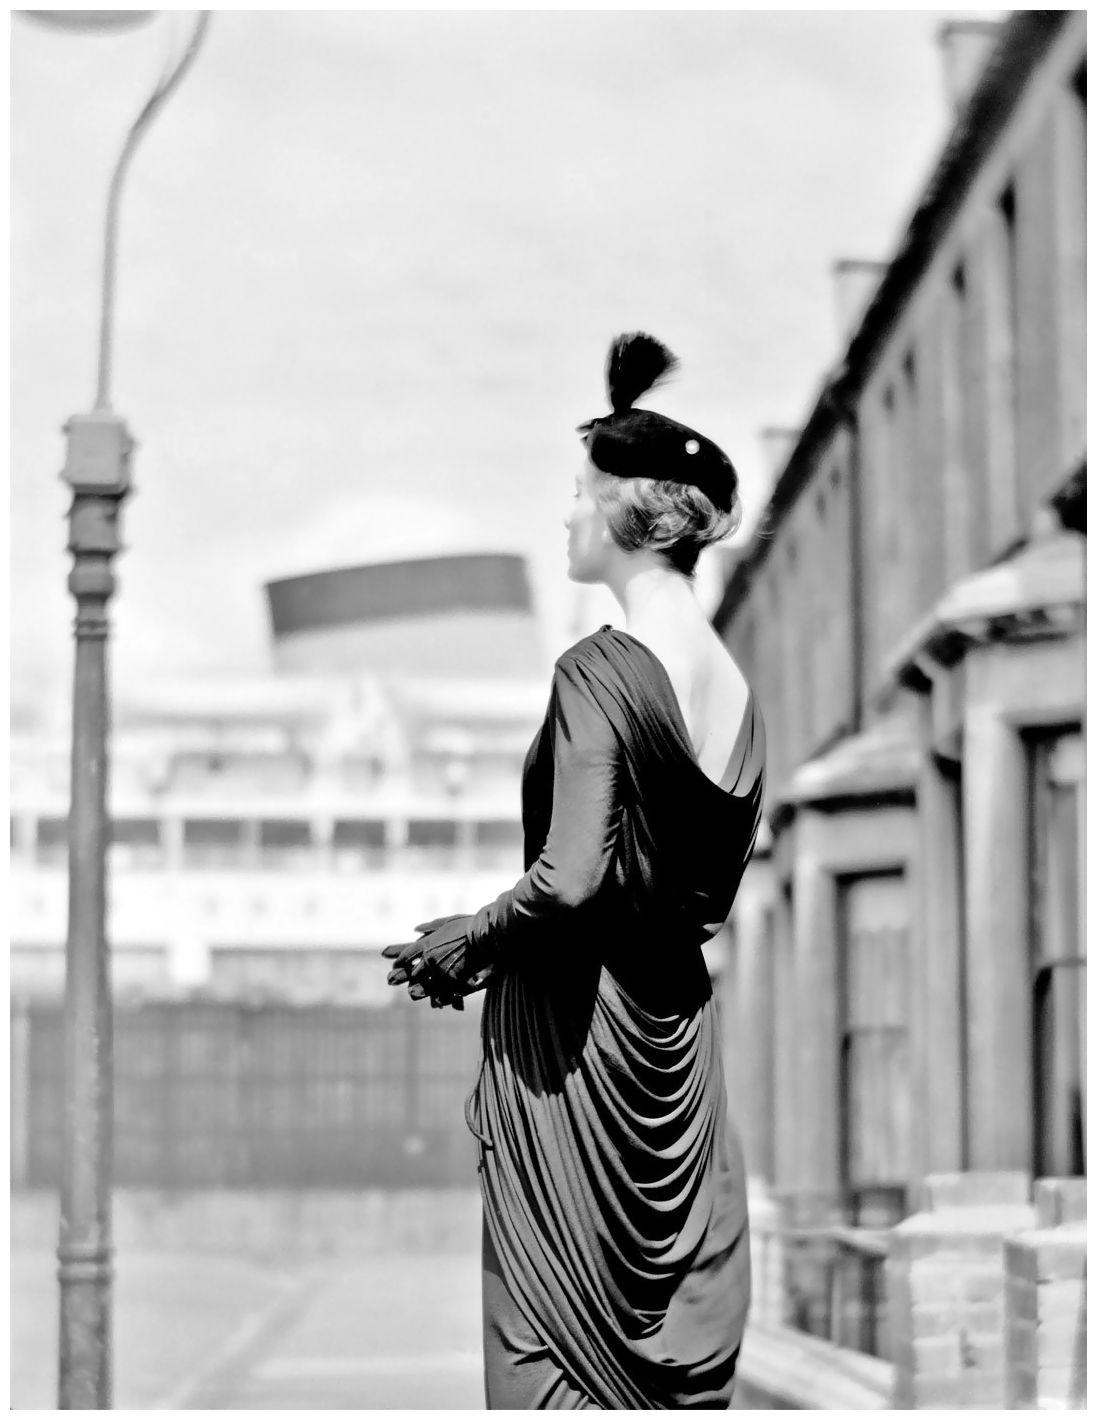 Pagan Grigg wearing a Hardy Amies dress, Southampton, 1957 Photo Norman Parkinson